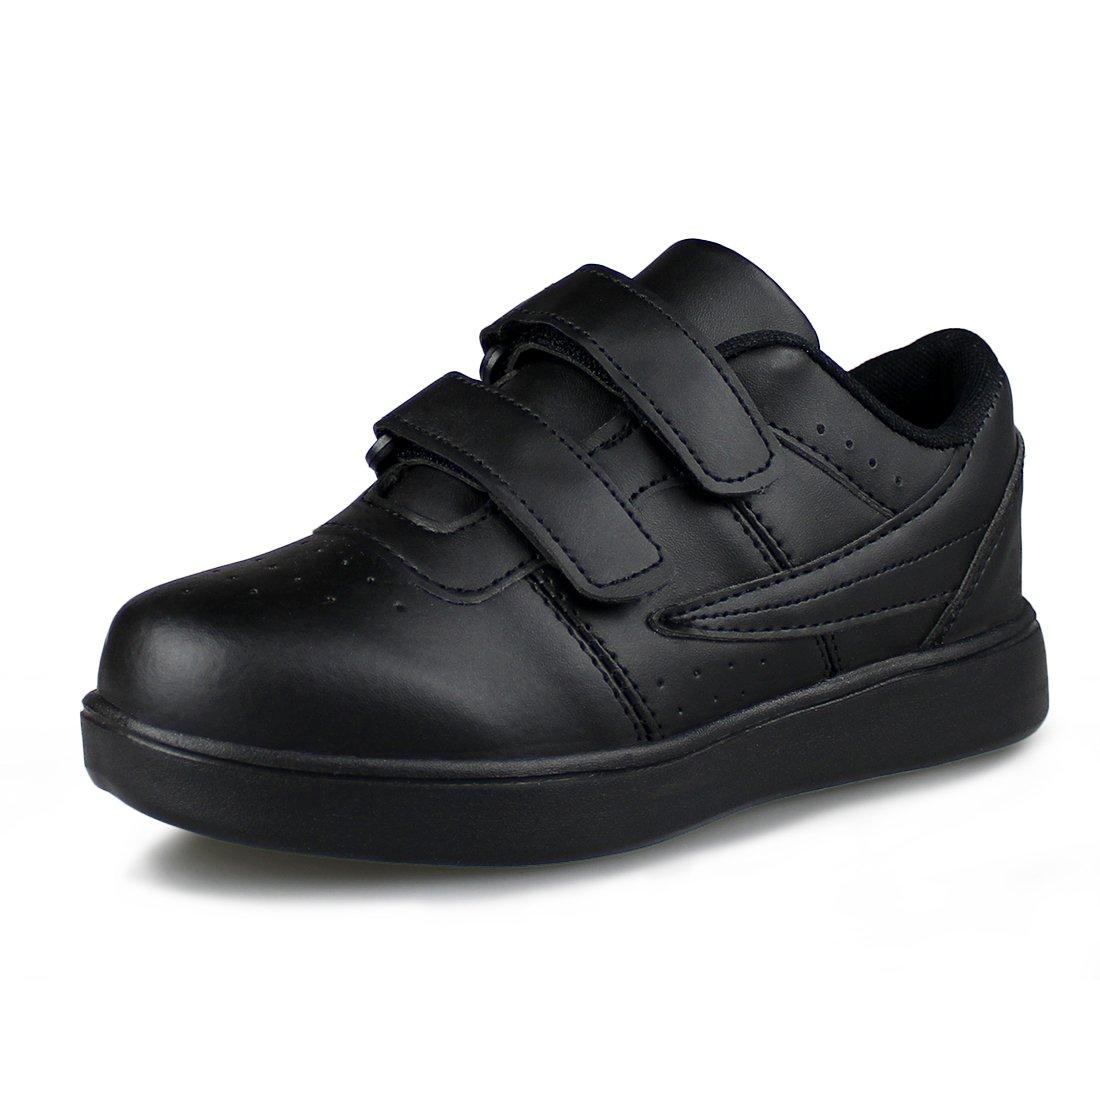 Hawkwell Kids School Uniform Sport Shoes(Toddler/Little Kid),Black PU,7 M US